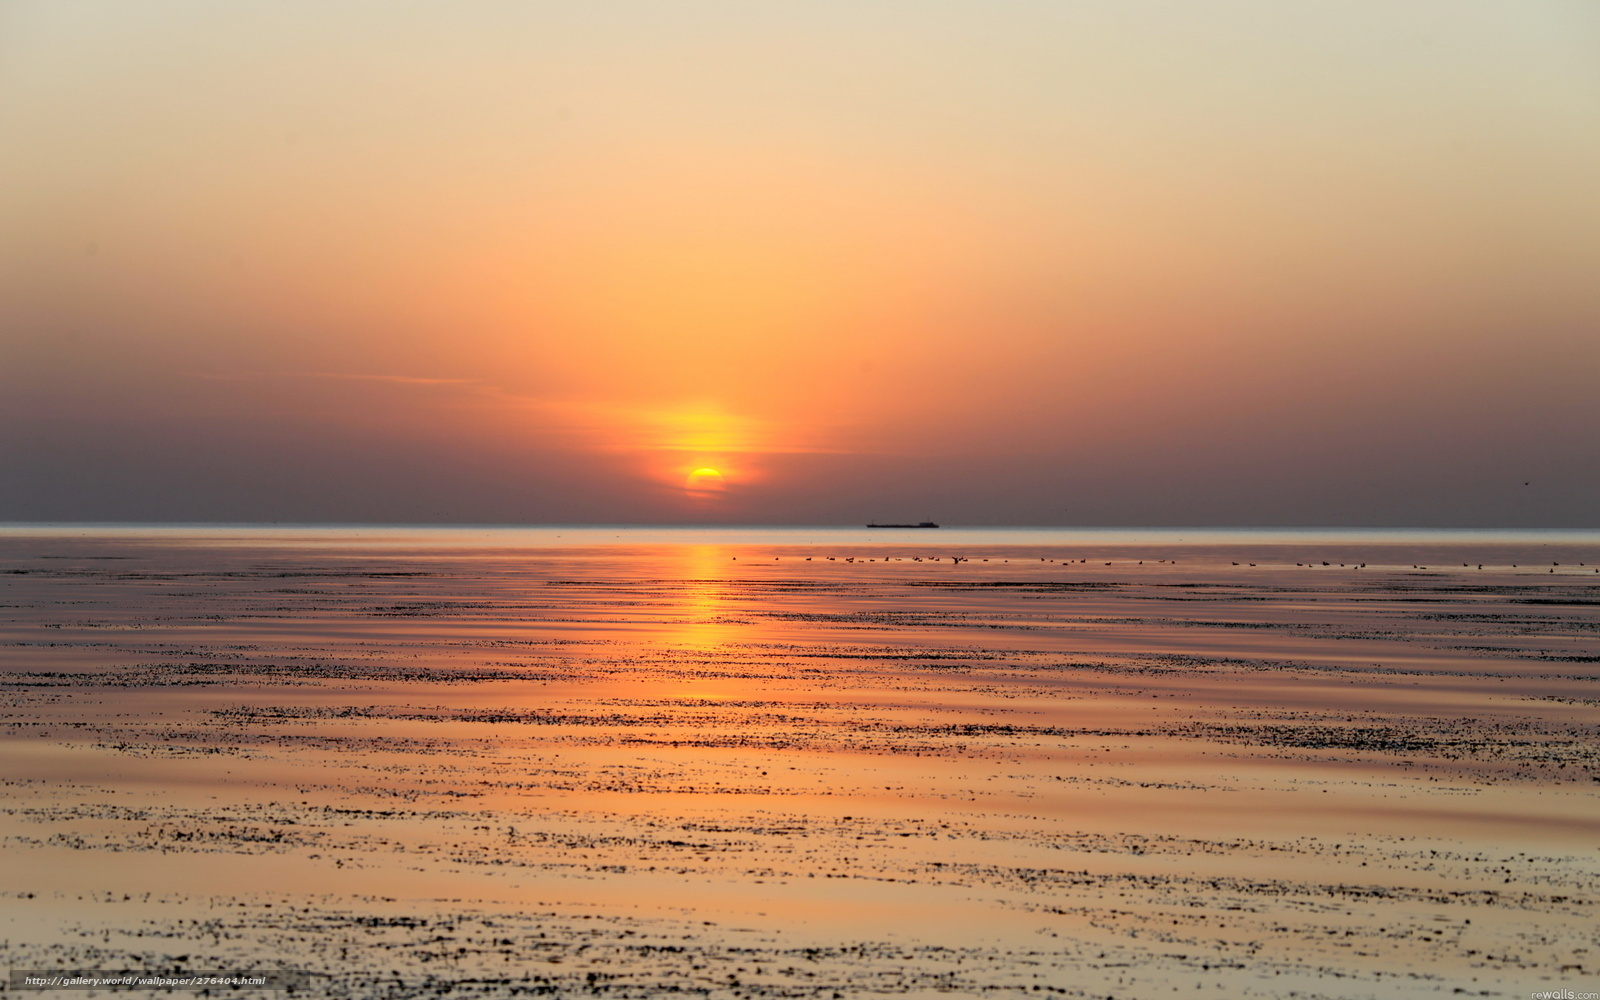 Tlcharger Fond d'ecran coucher du soleil, mer, Nature ...